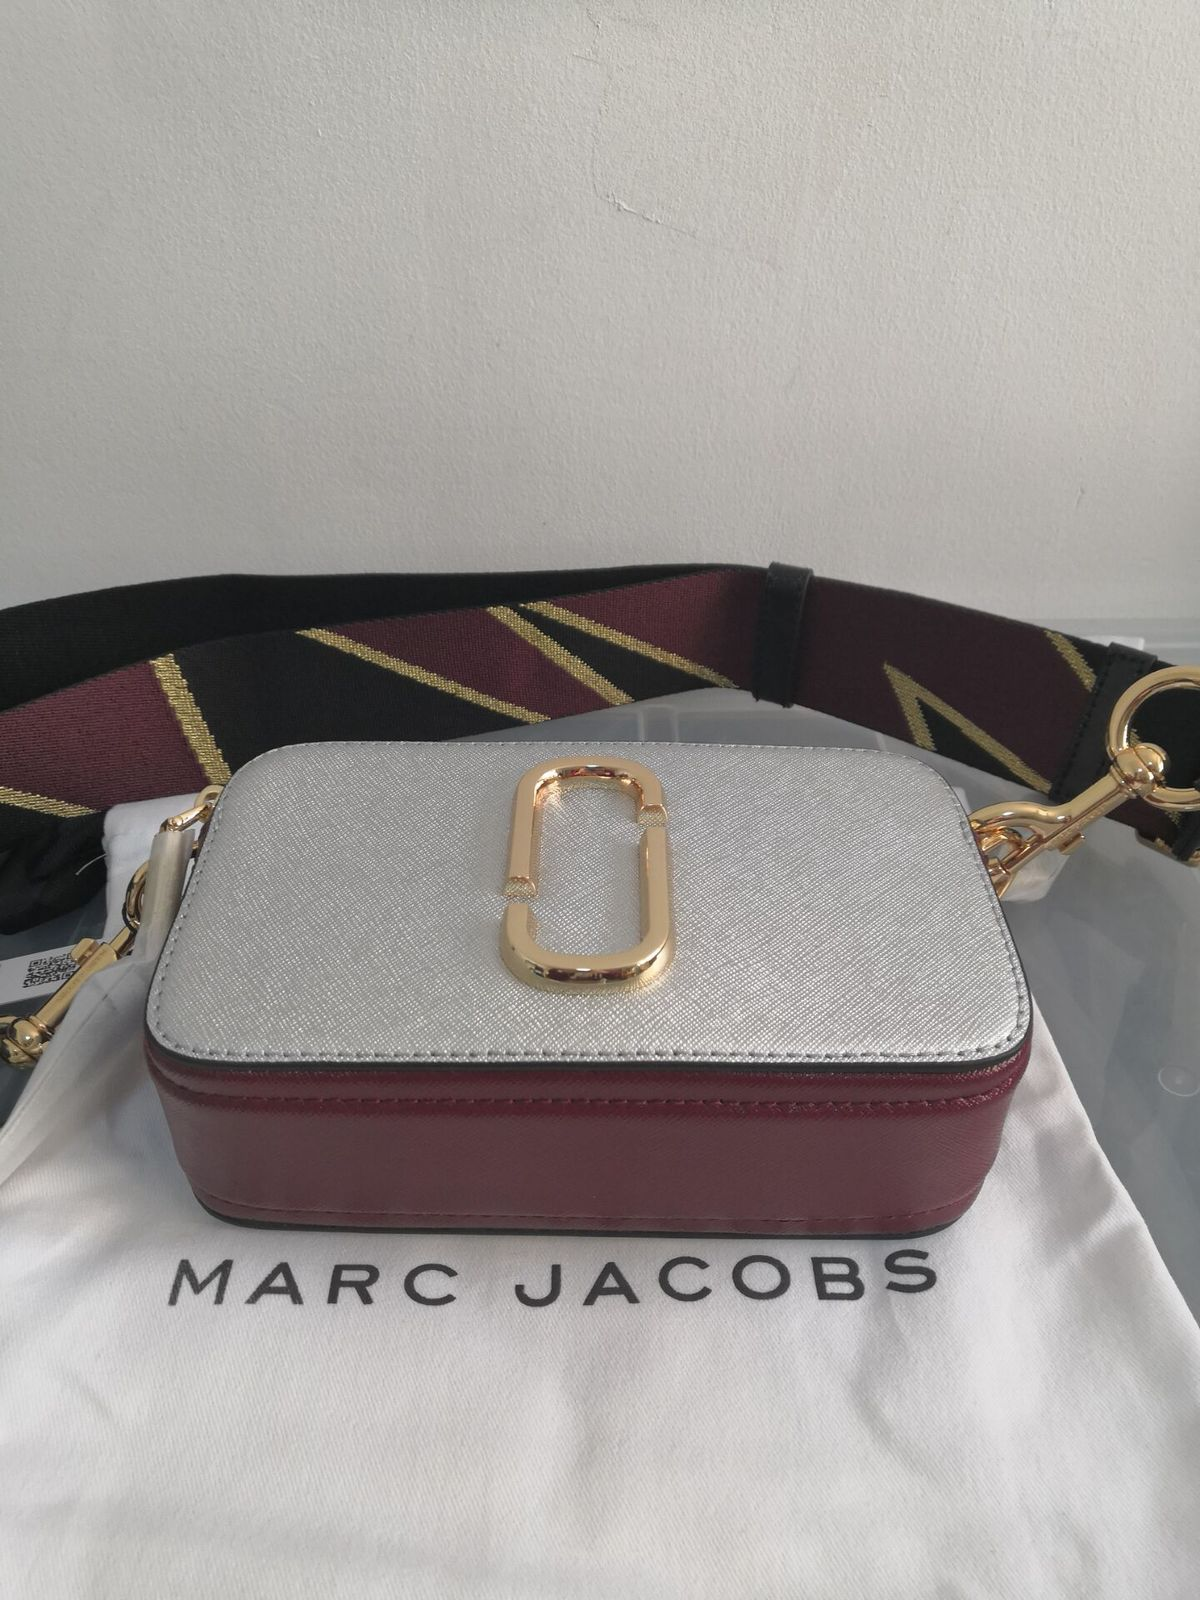 1a569be84e813 Marc Jacobs Snapshot Small Camera Bag Crossbody Bag Silver Multi Auth